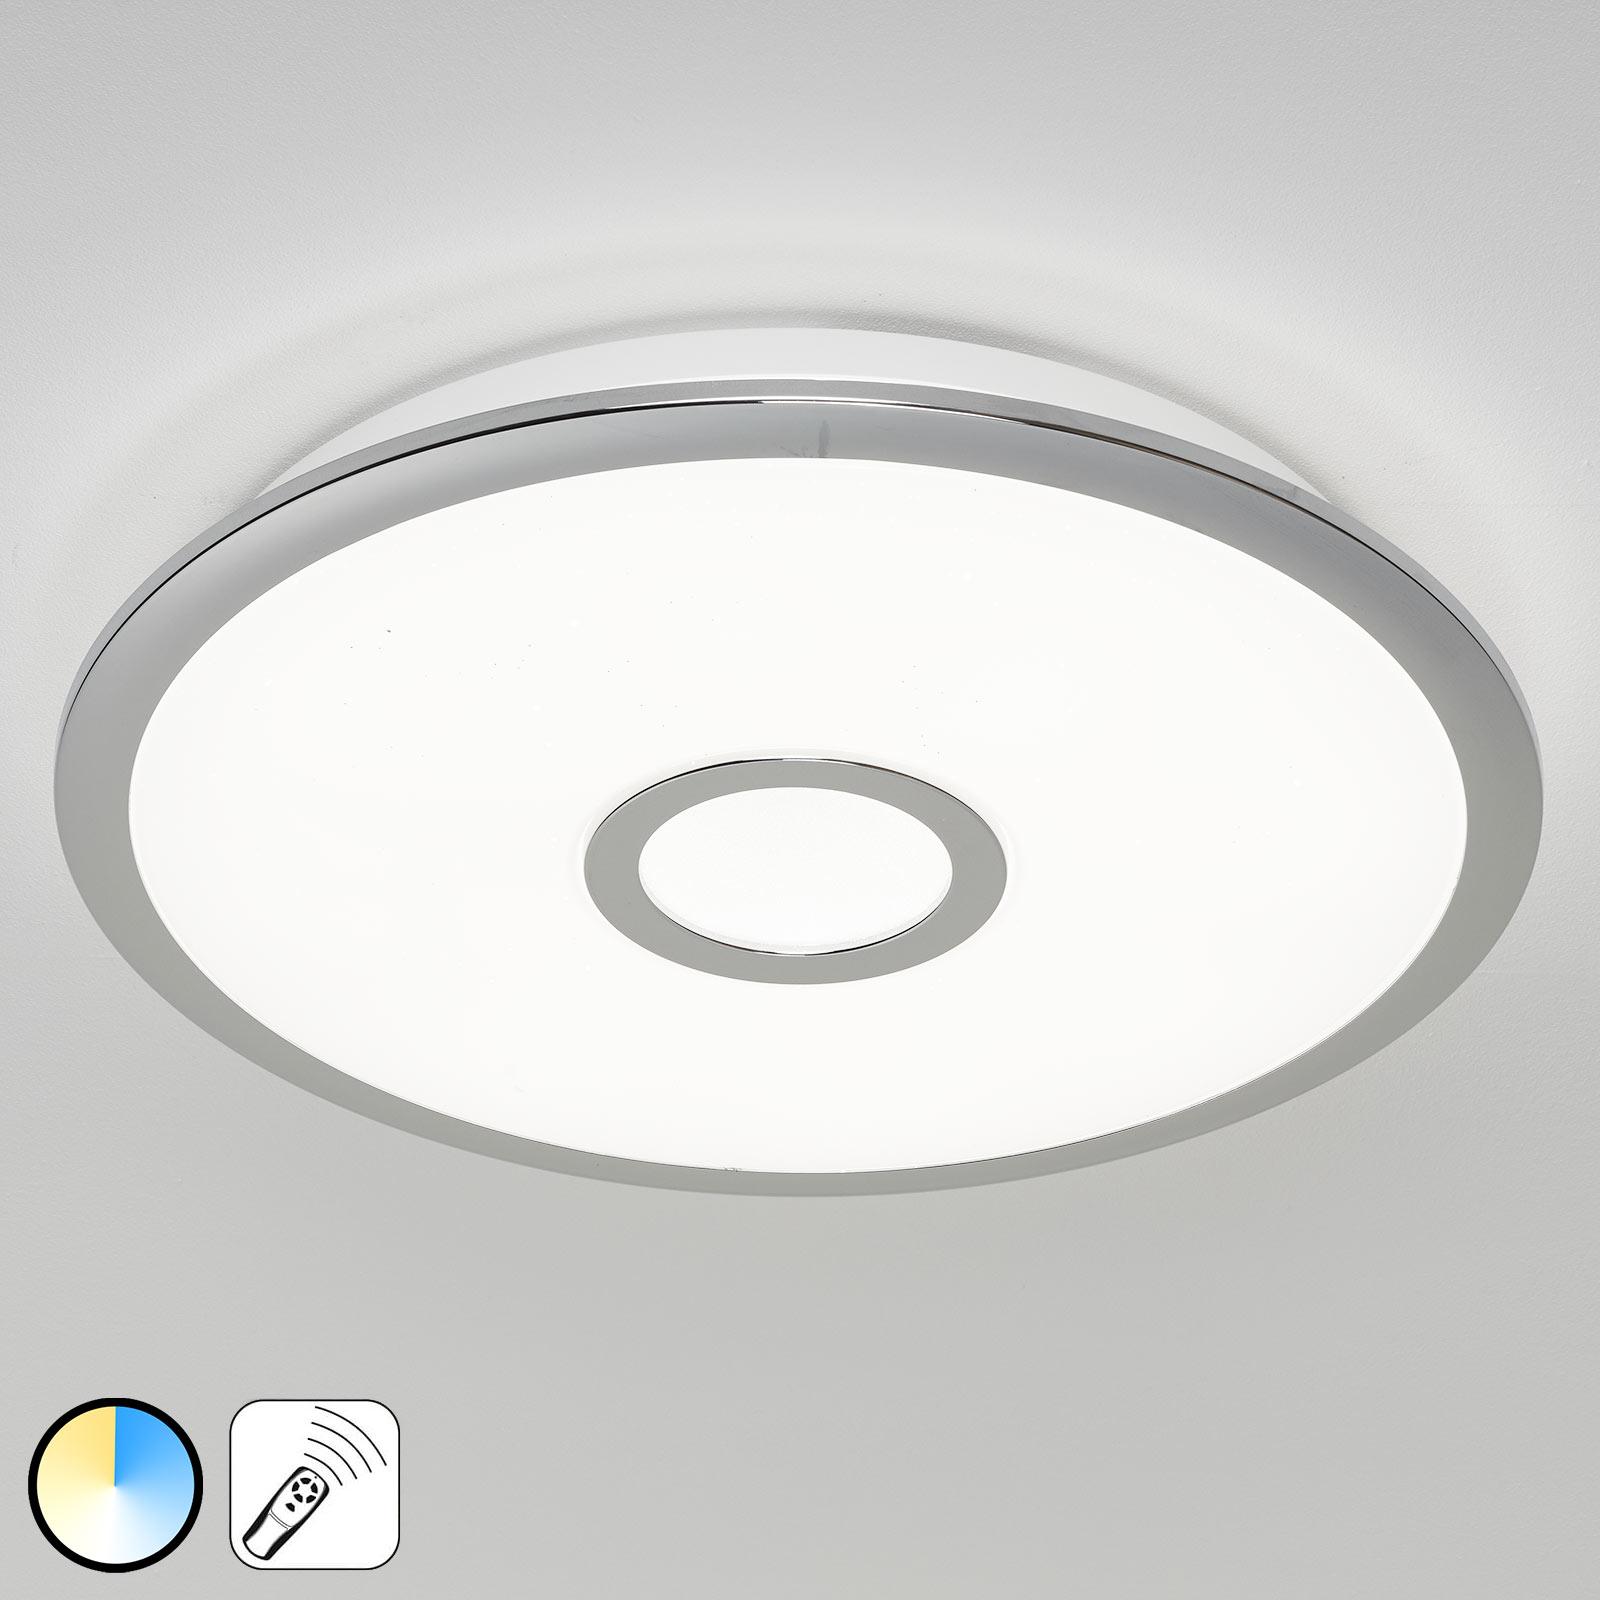 LED-kattovalaisin Osaka, muistitoiminto